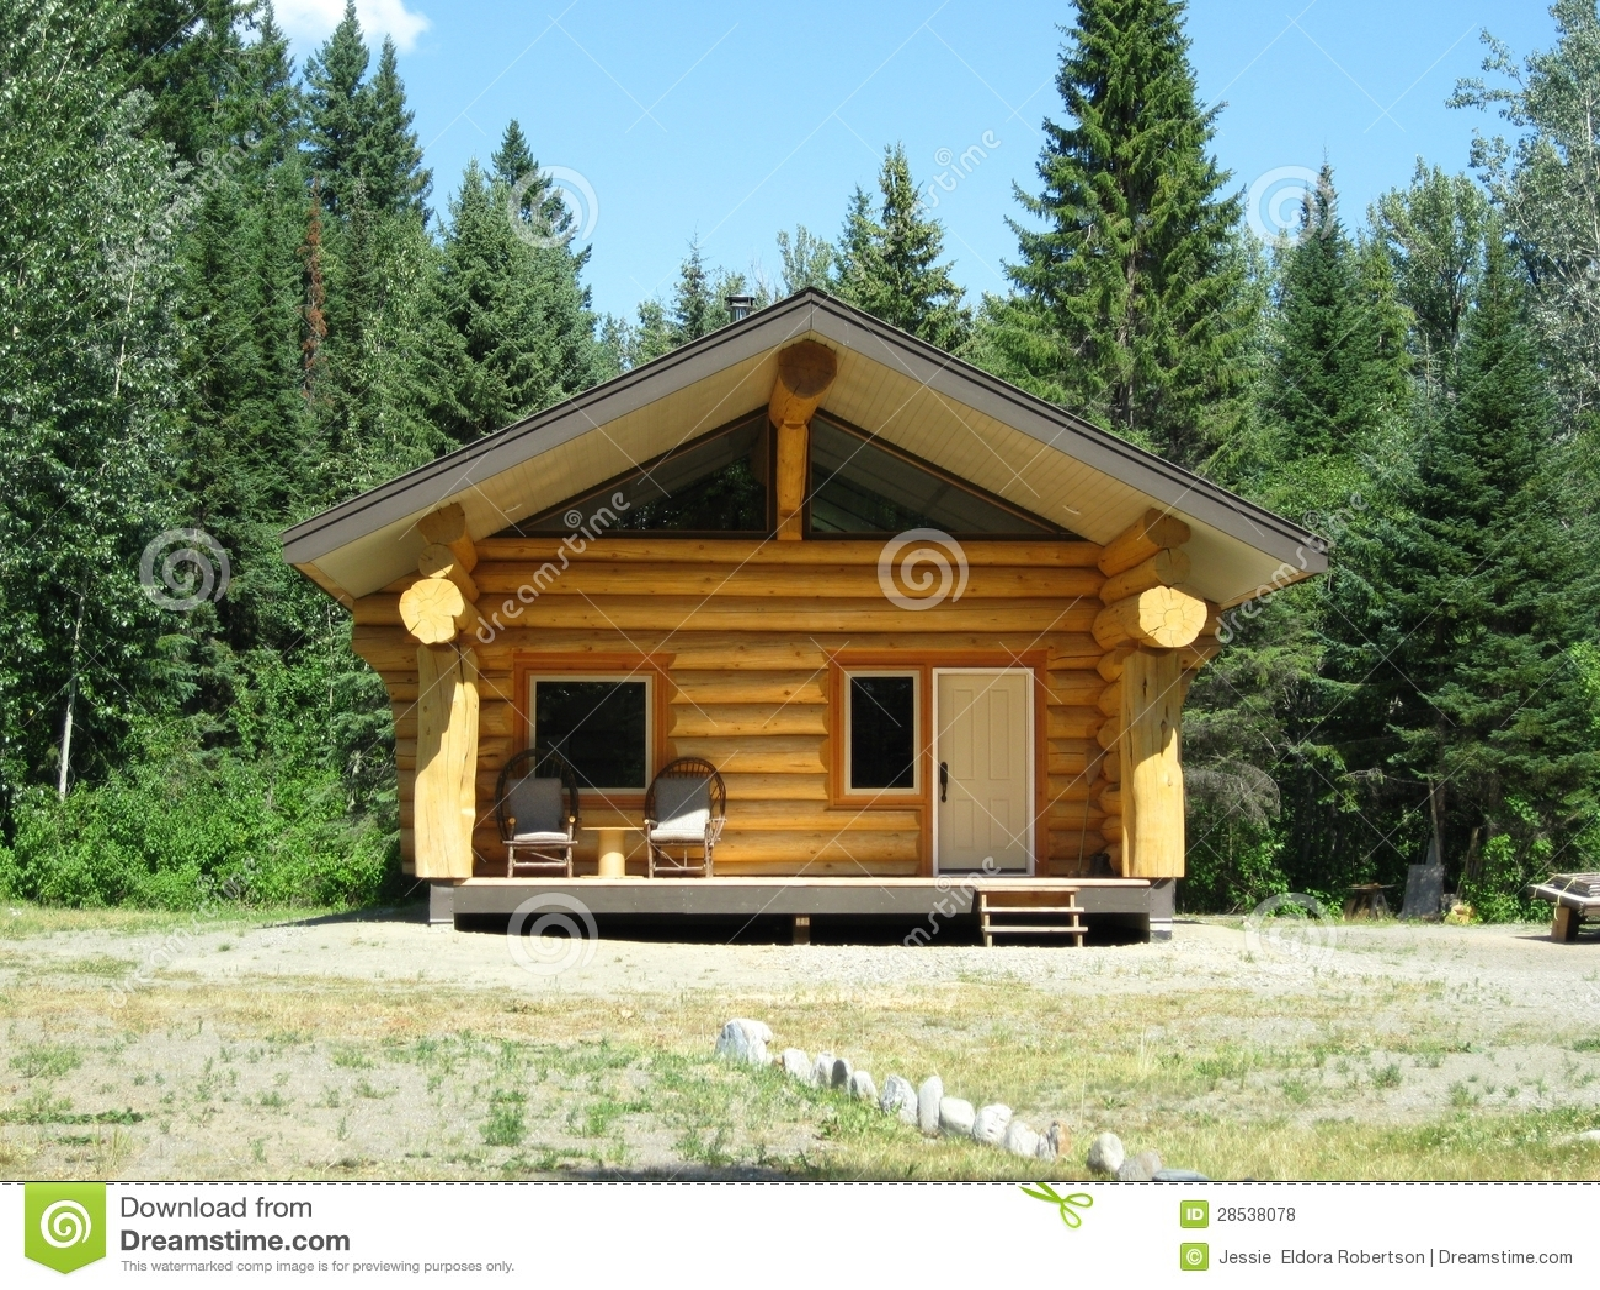 New Log Cabin Royalty Free Stock Photos Image 28538078